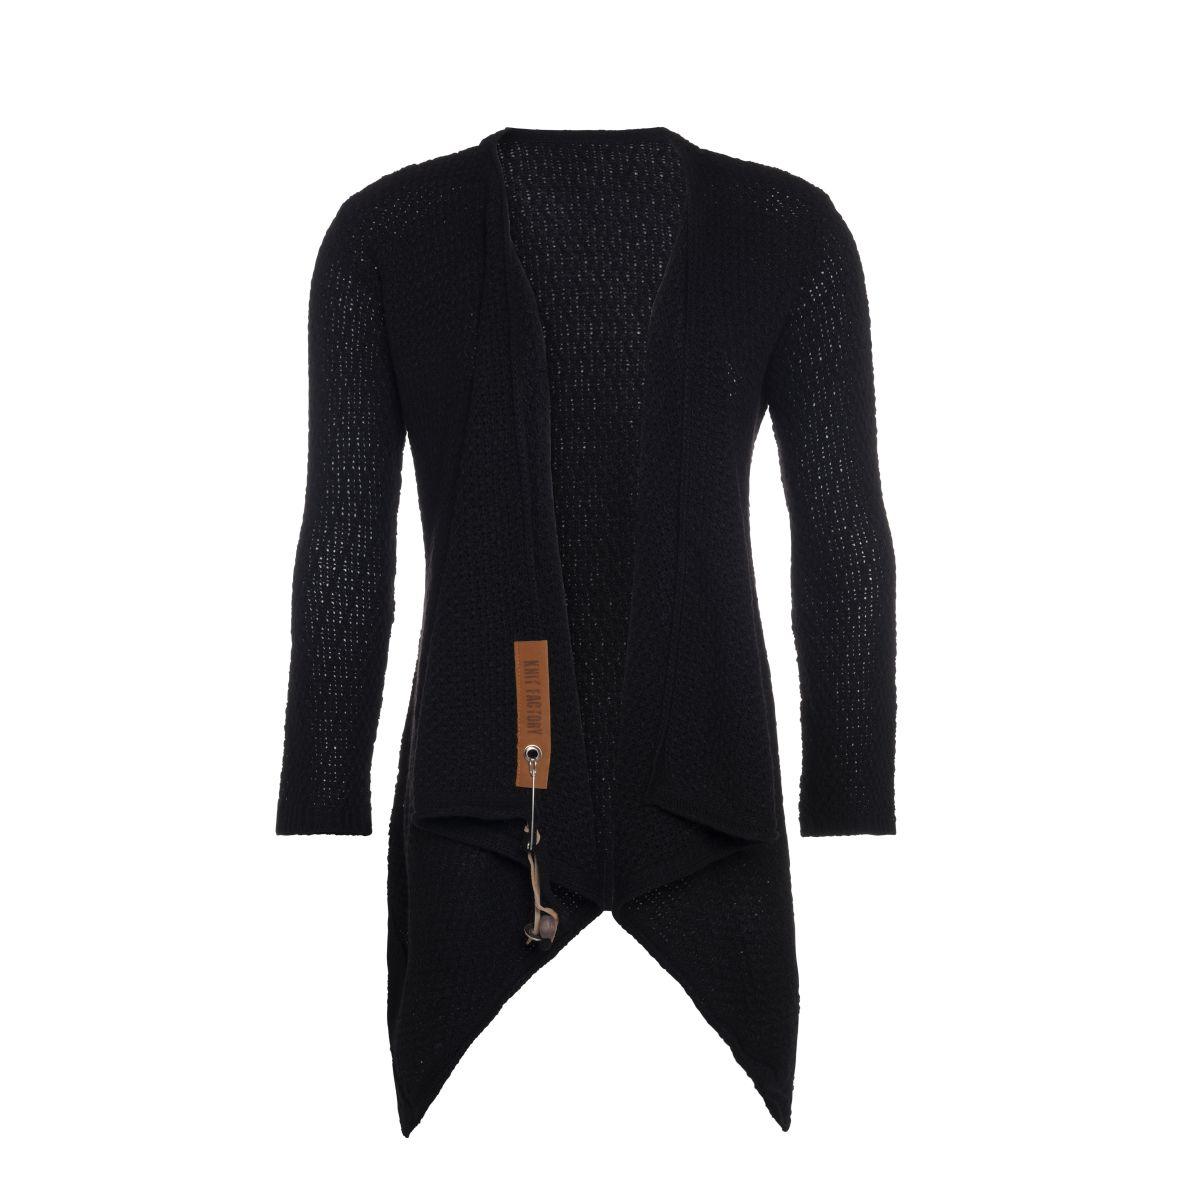 emy knitted cardigan black 4042